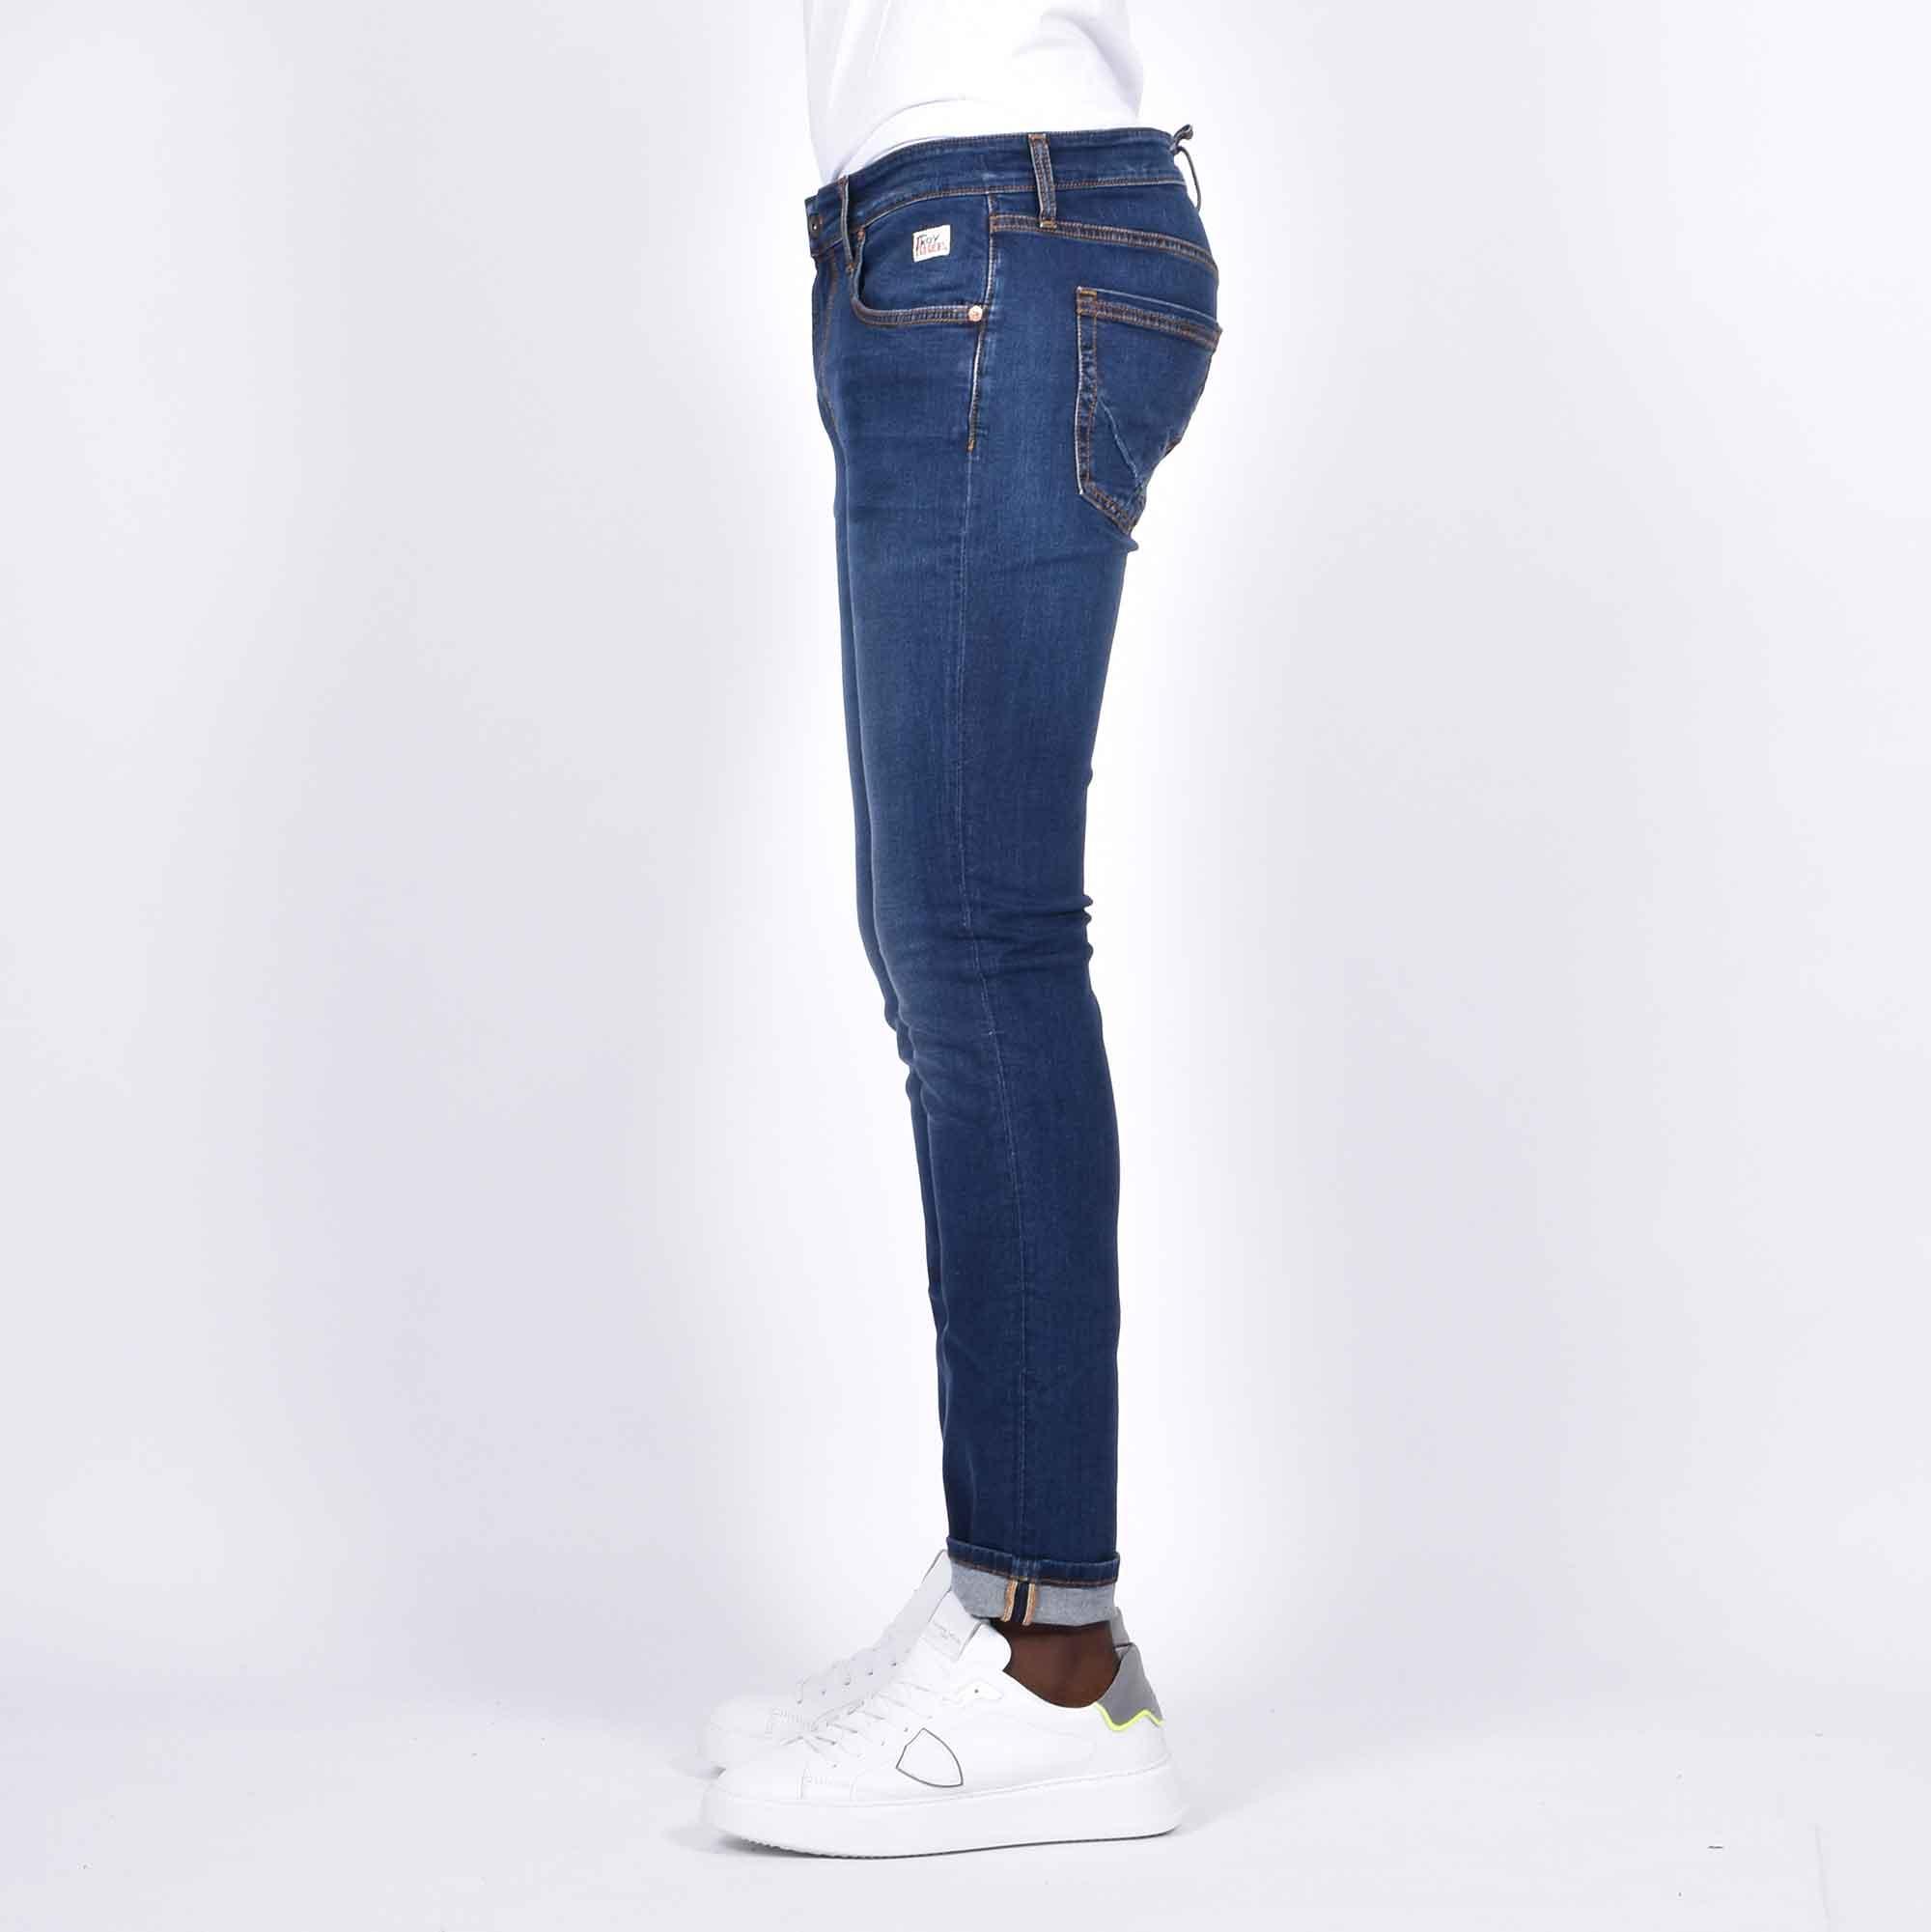 Jeans 317 joice- Denim medio